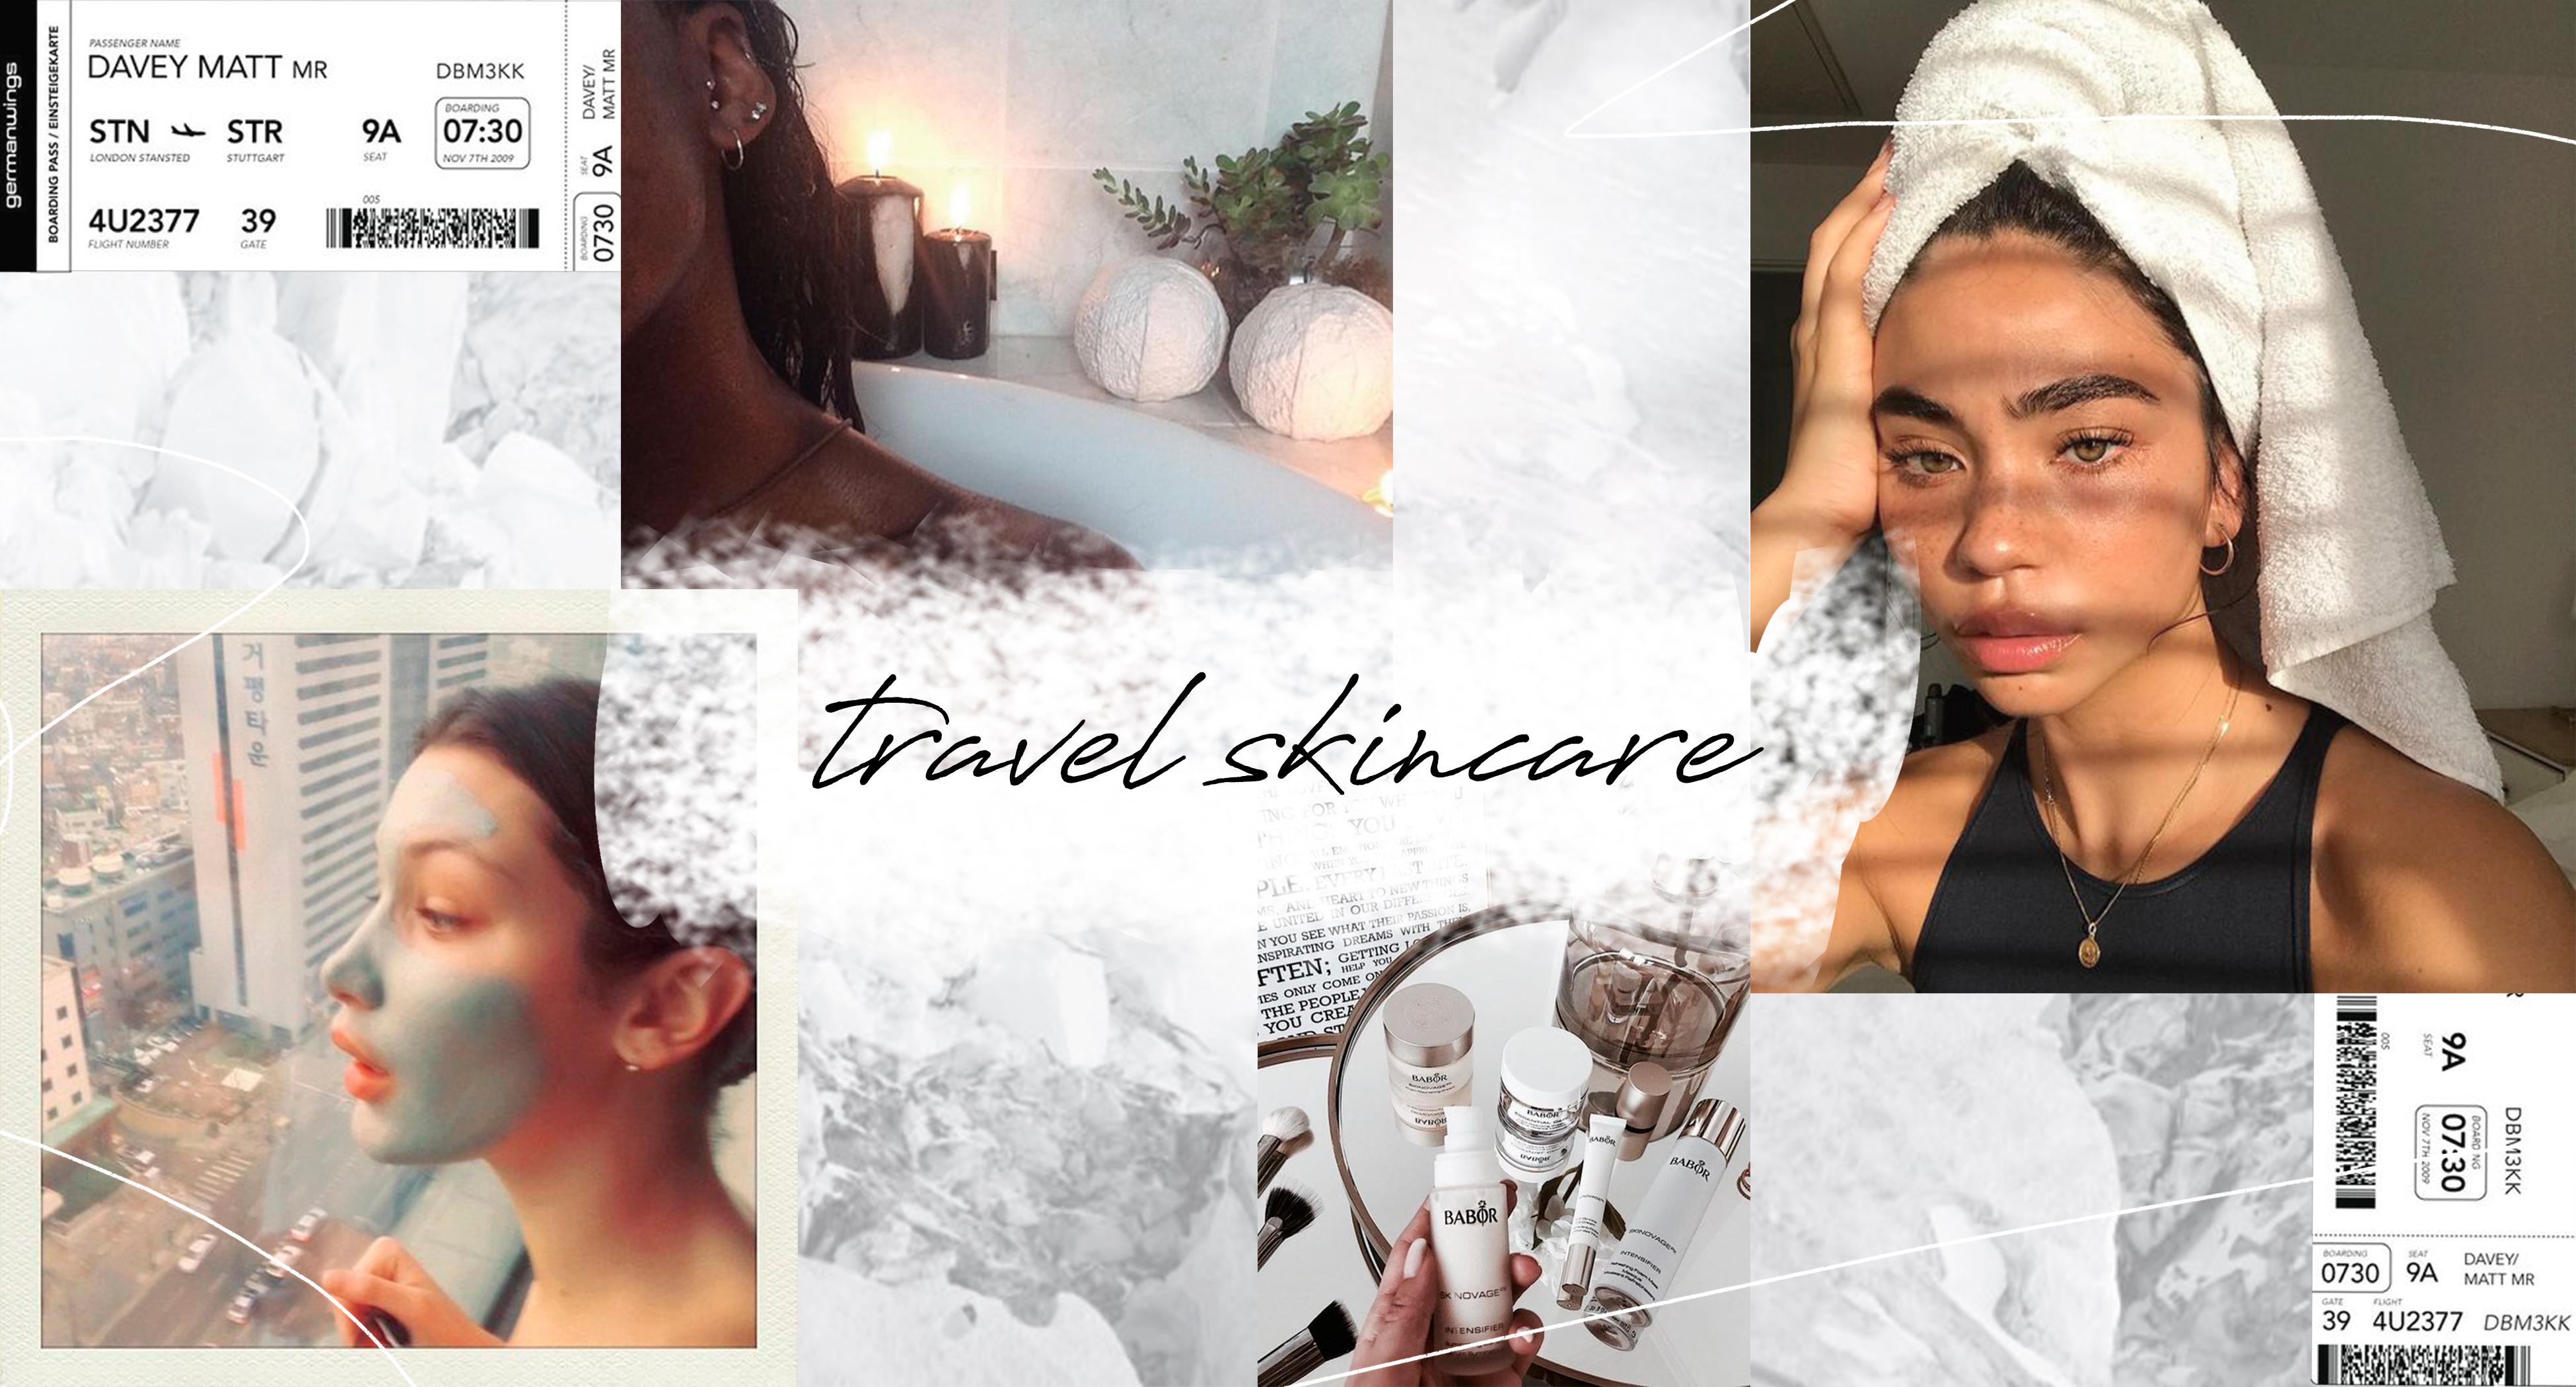 TravelSkincareBlogTitle